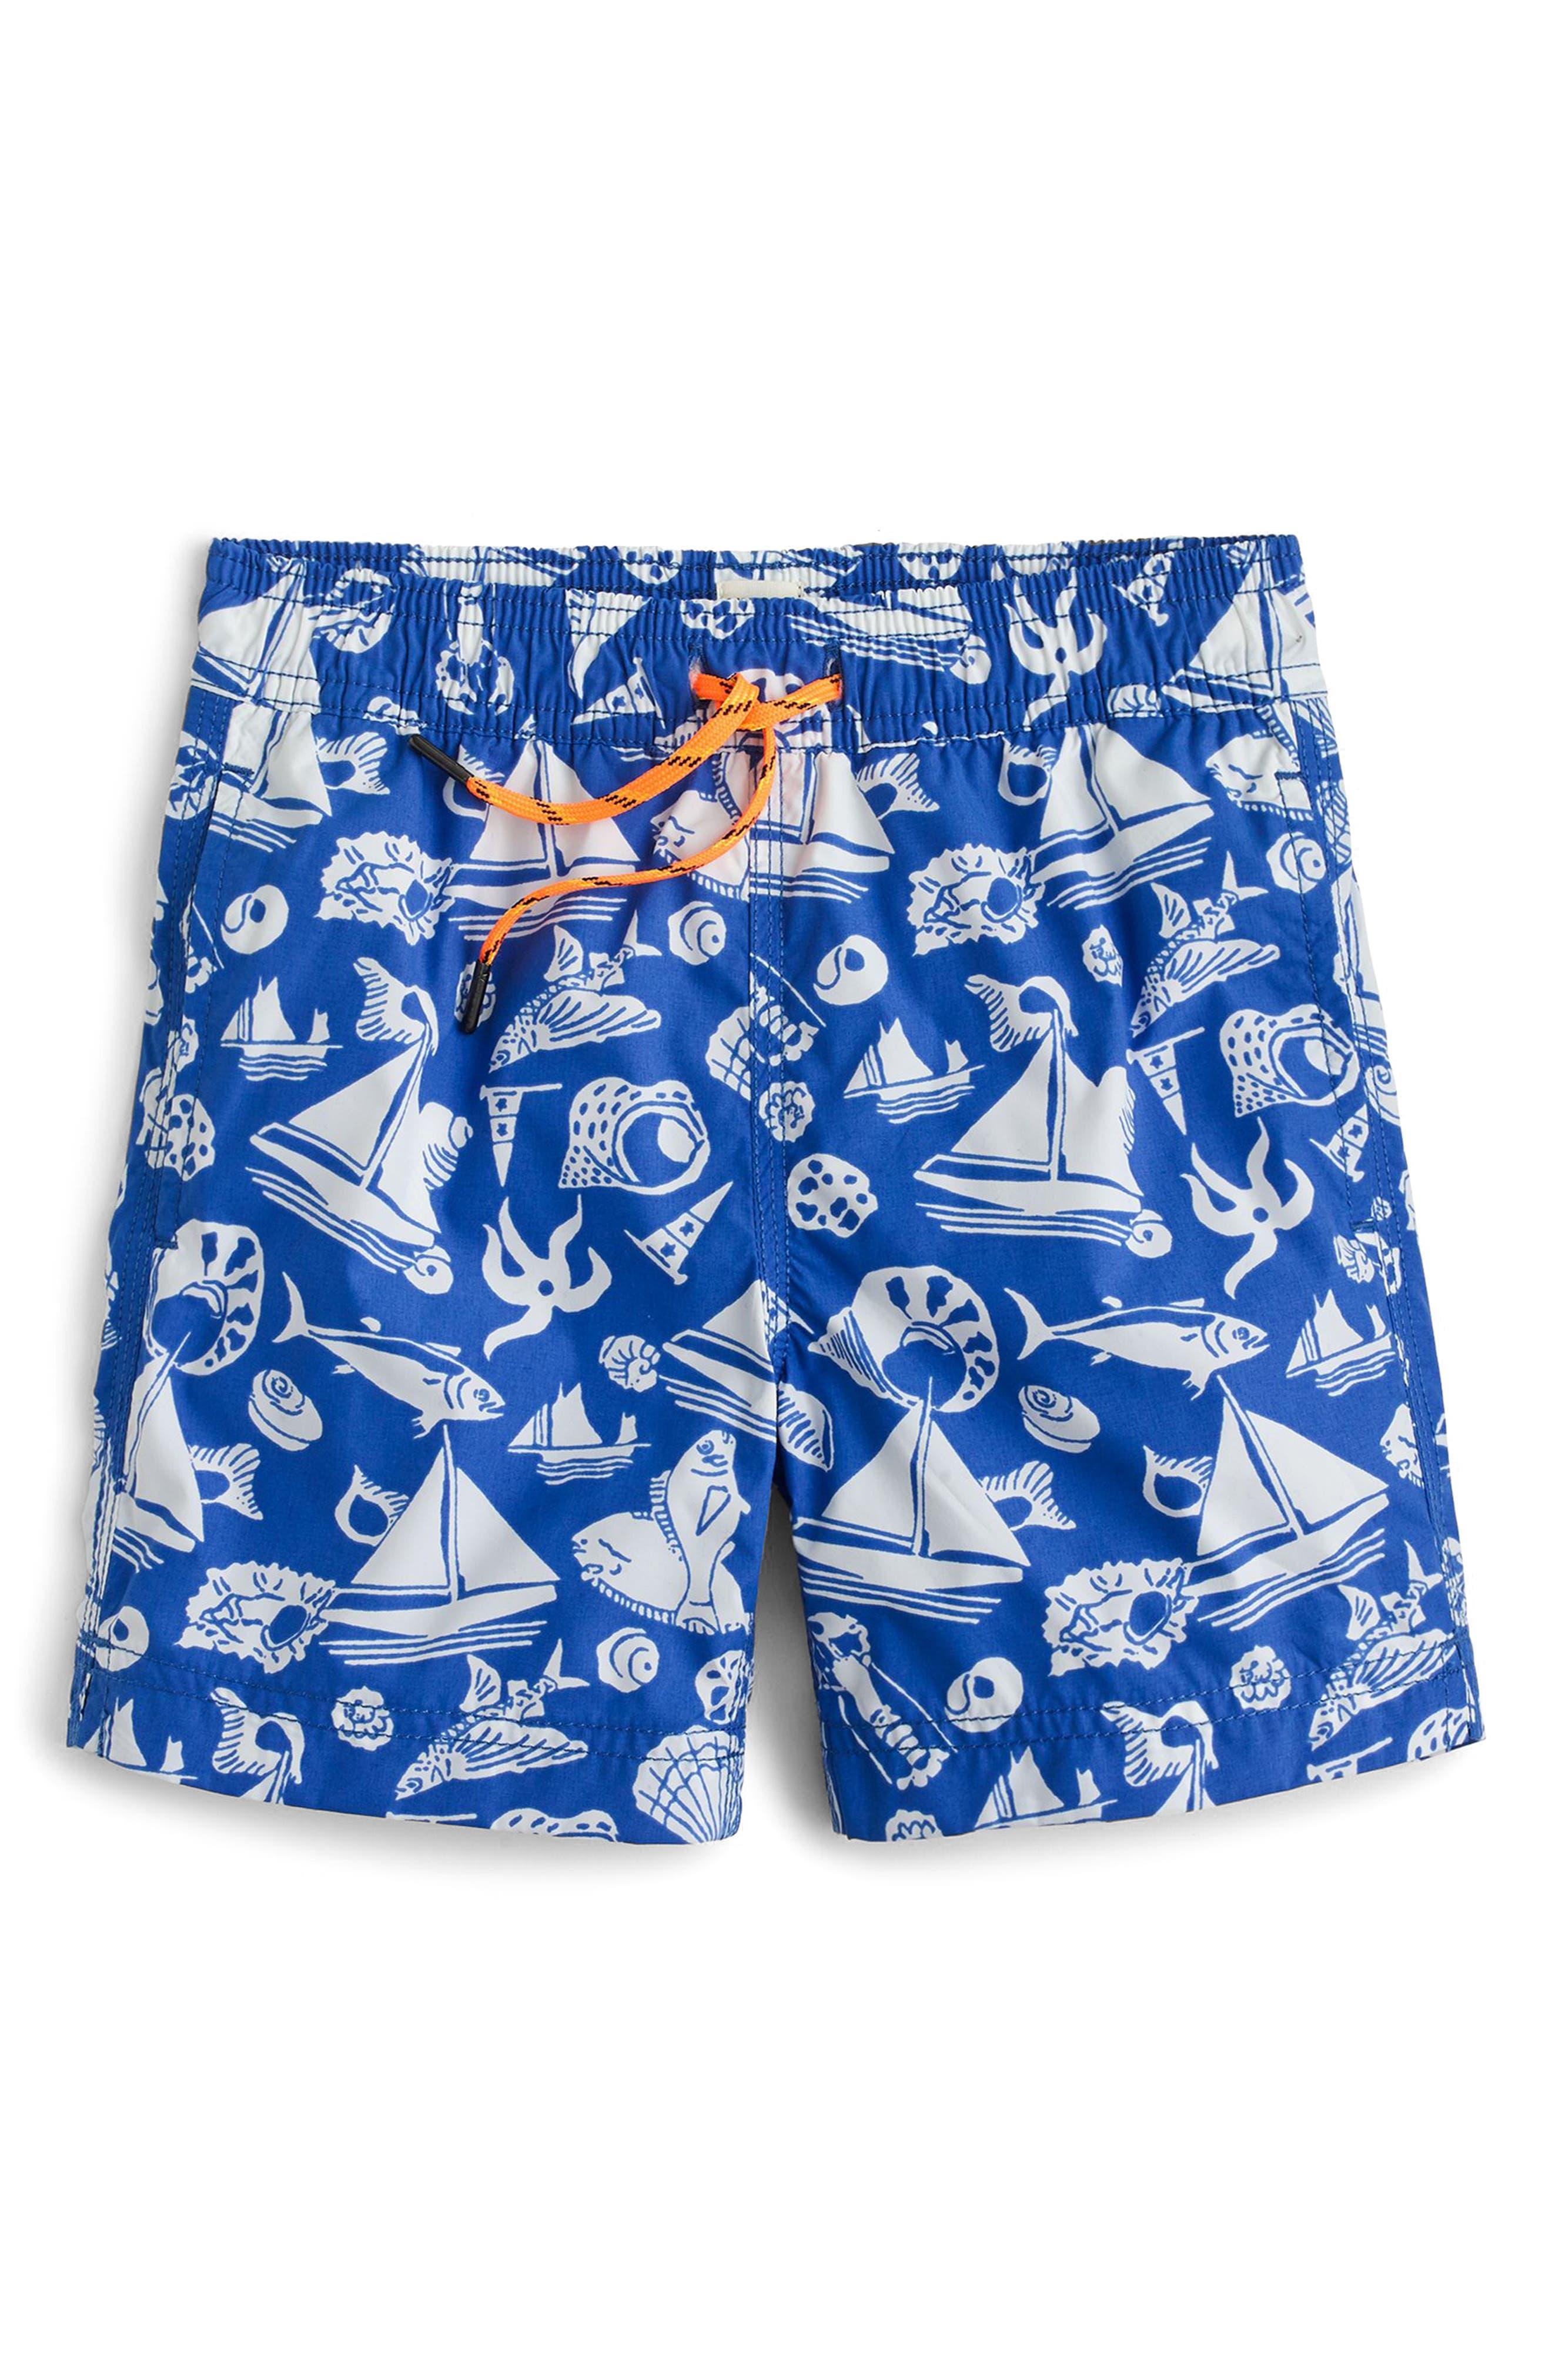 Seaside Life Swim Trunks,                         Main,                         color, Royal Bay